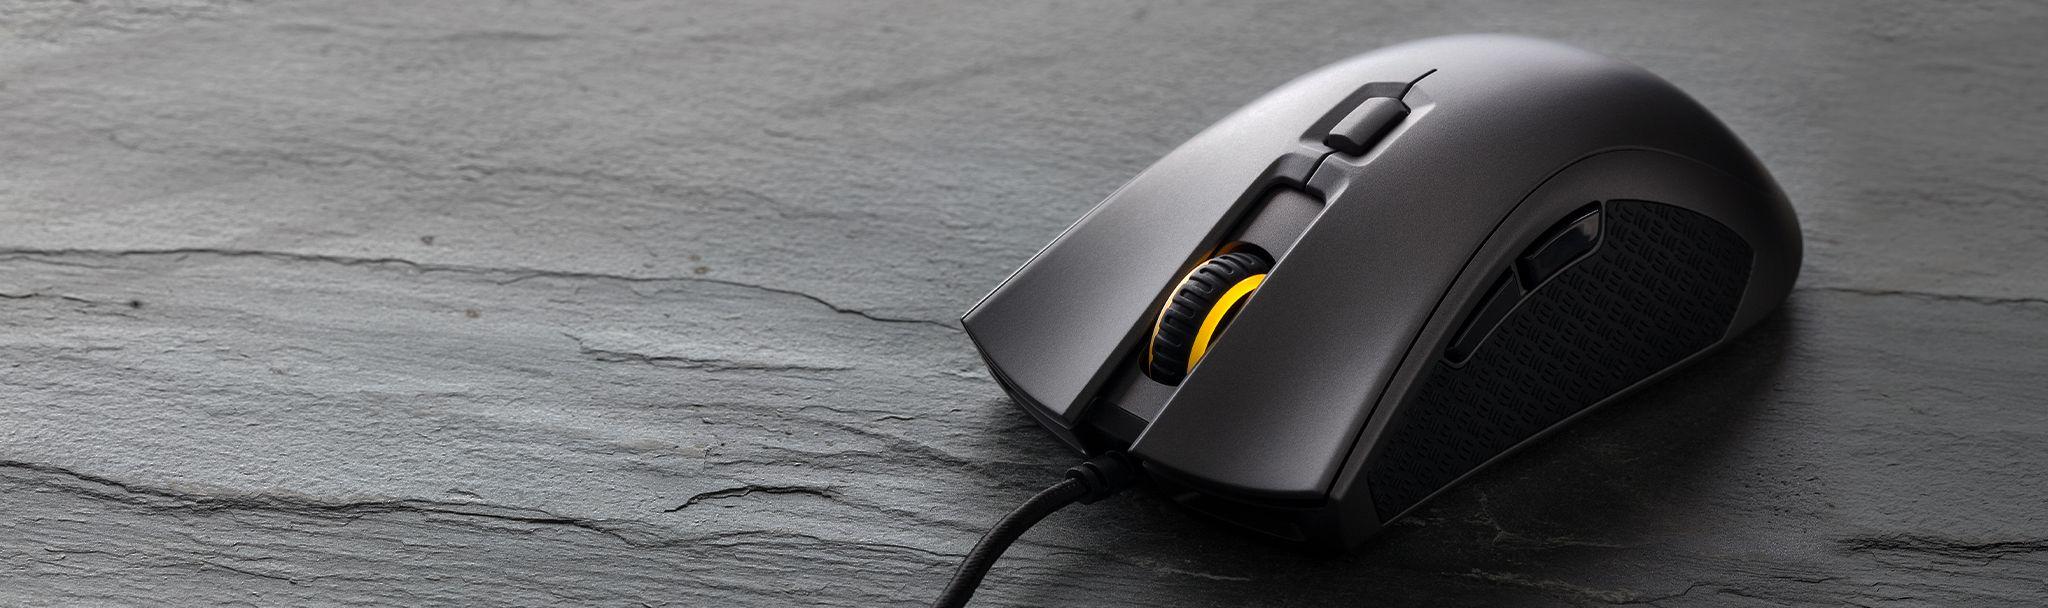 hx keyfeatures mice pulsefire fps pro 3 lg1